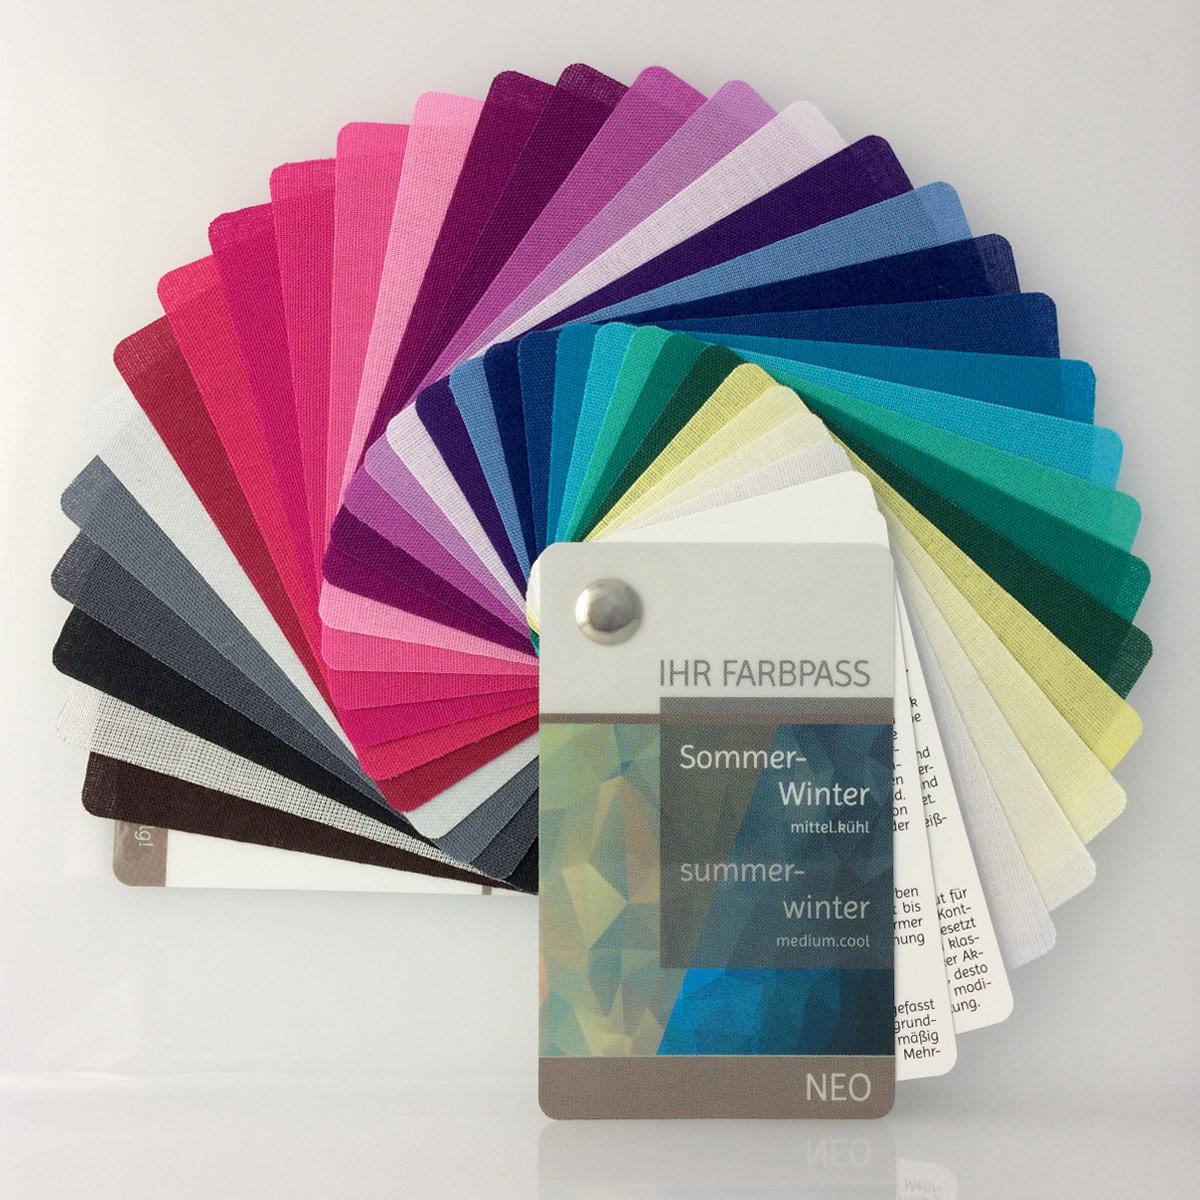 stoff farbpass sommer winter mit 30 farben neo komood shop. Black Bedroom Furniture Sets. Home Design Ideas